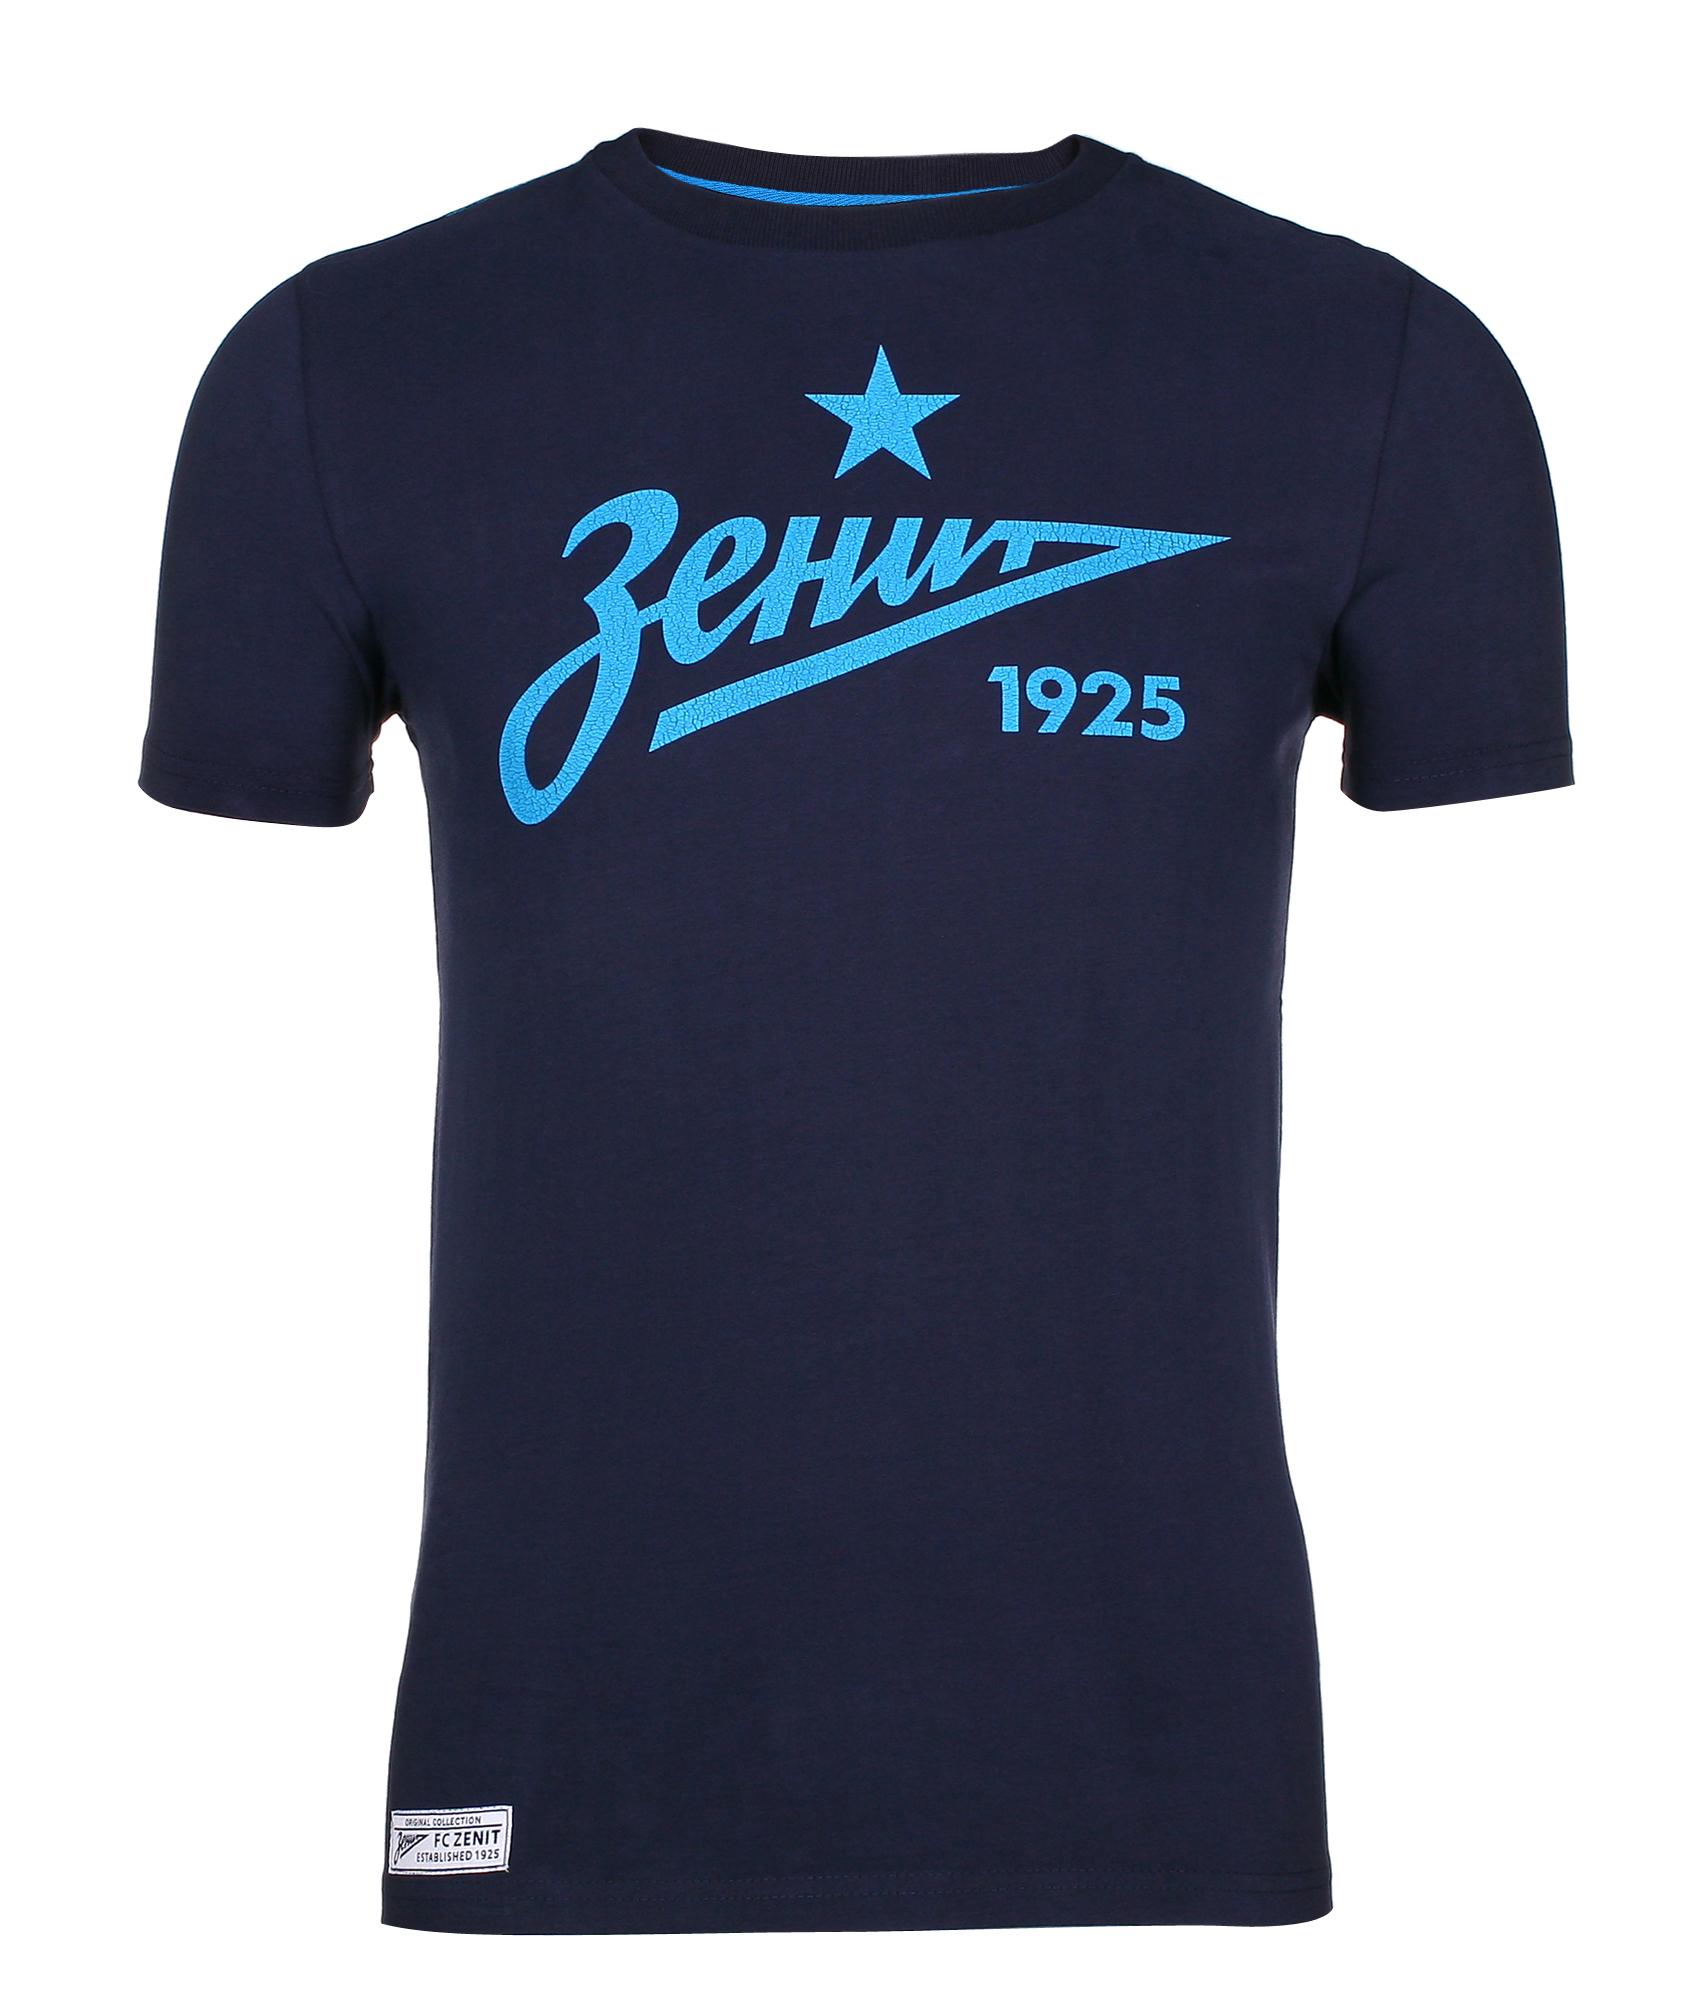 Футболка мужская, Цвет-Темно-Синий, Размер-XL футболка мужская top secret цвет темно синий spo3354gr размер xl 50